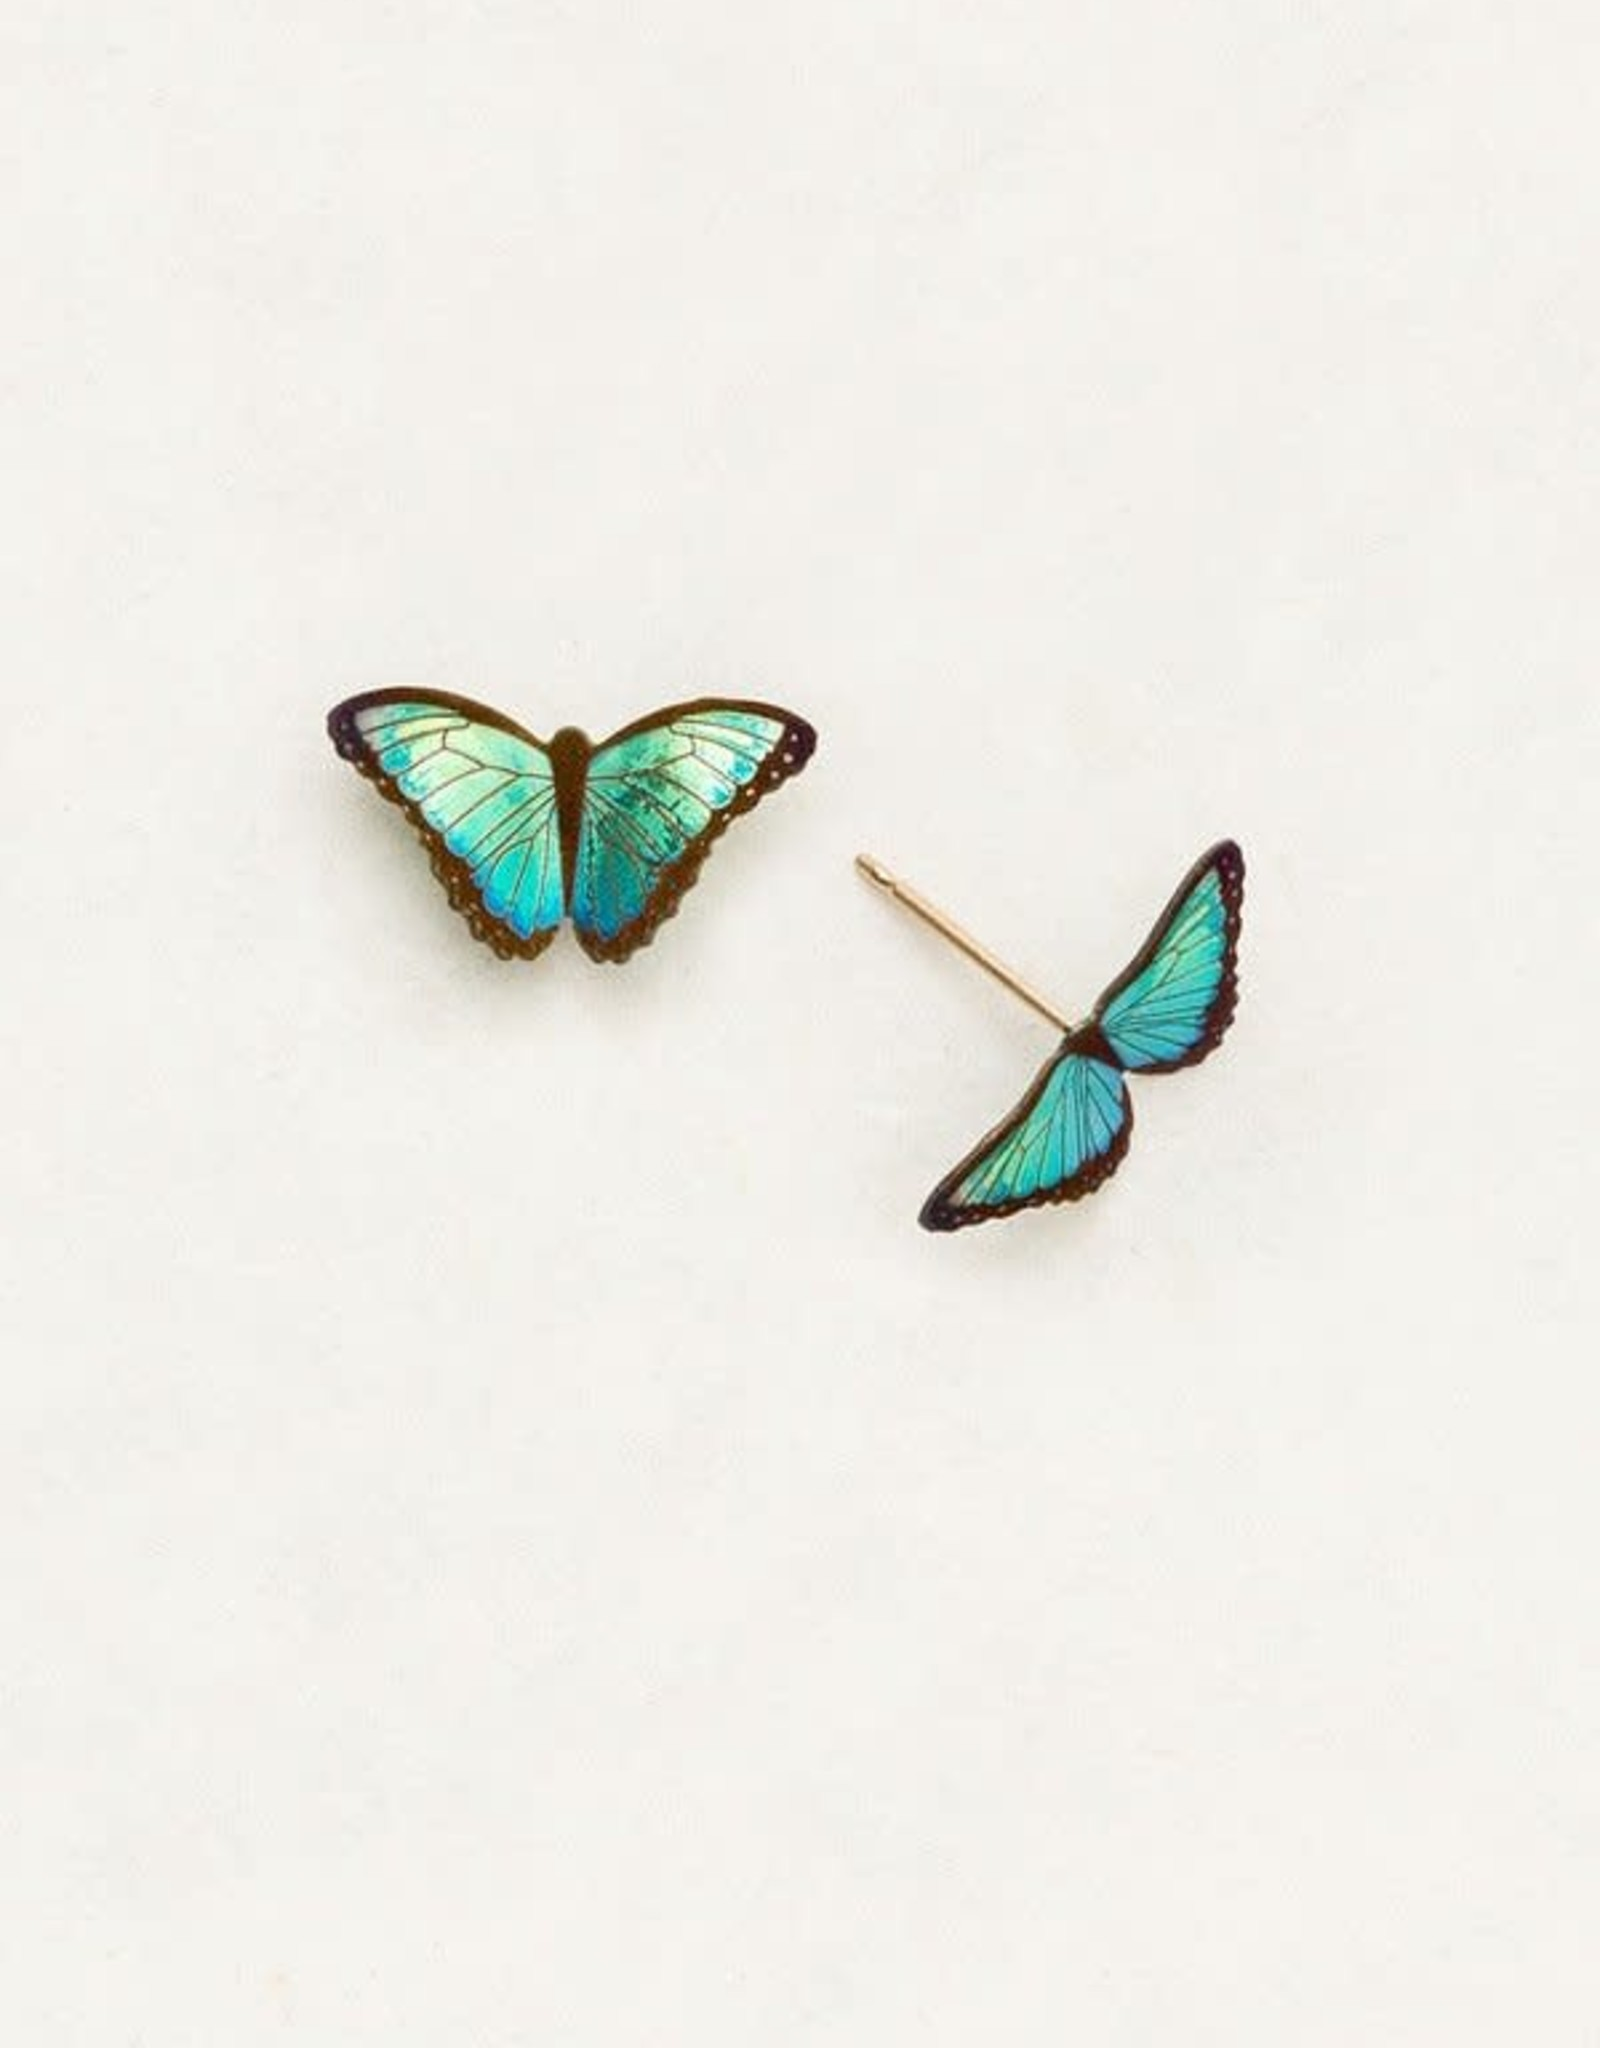 Holly Yashi Green Flash Petite Bella Butterfly Post Earrings